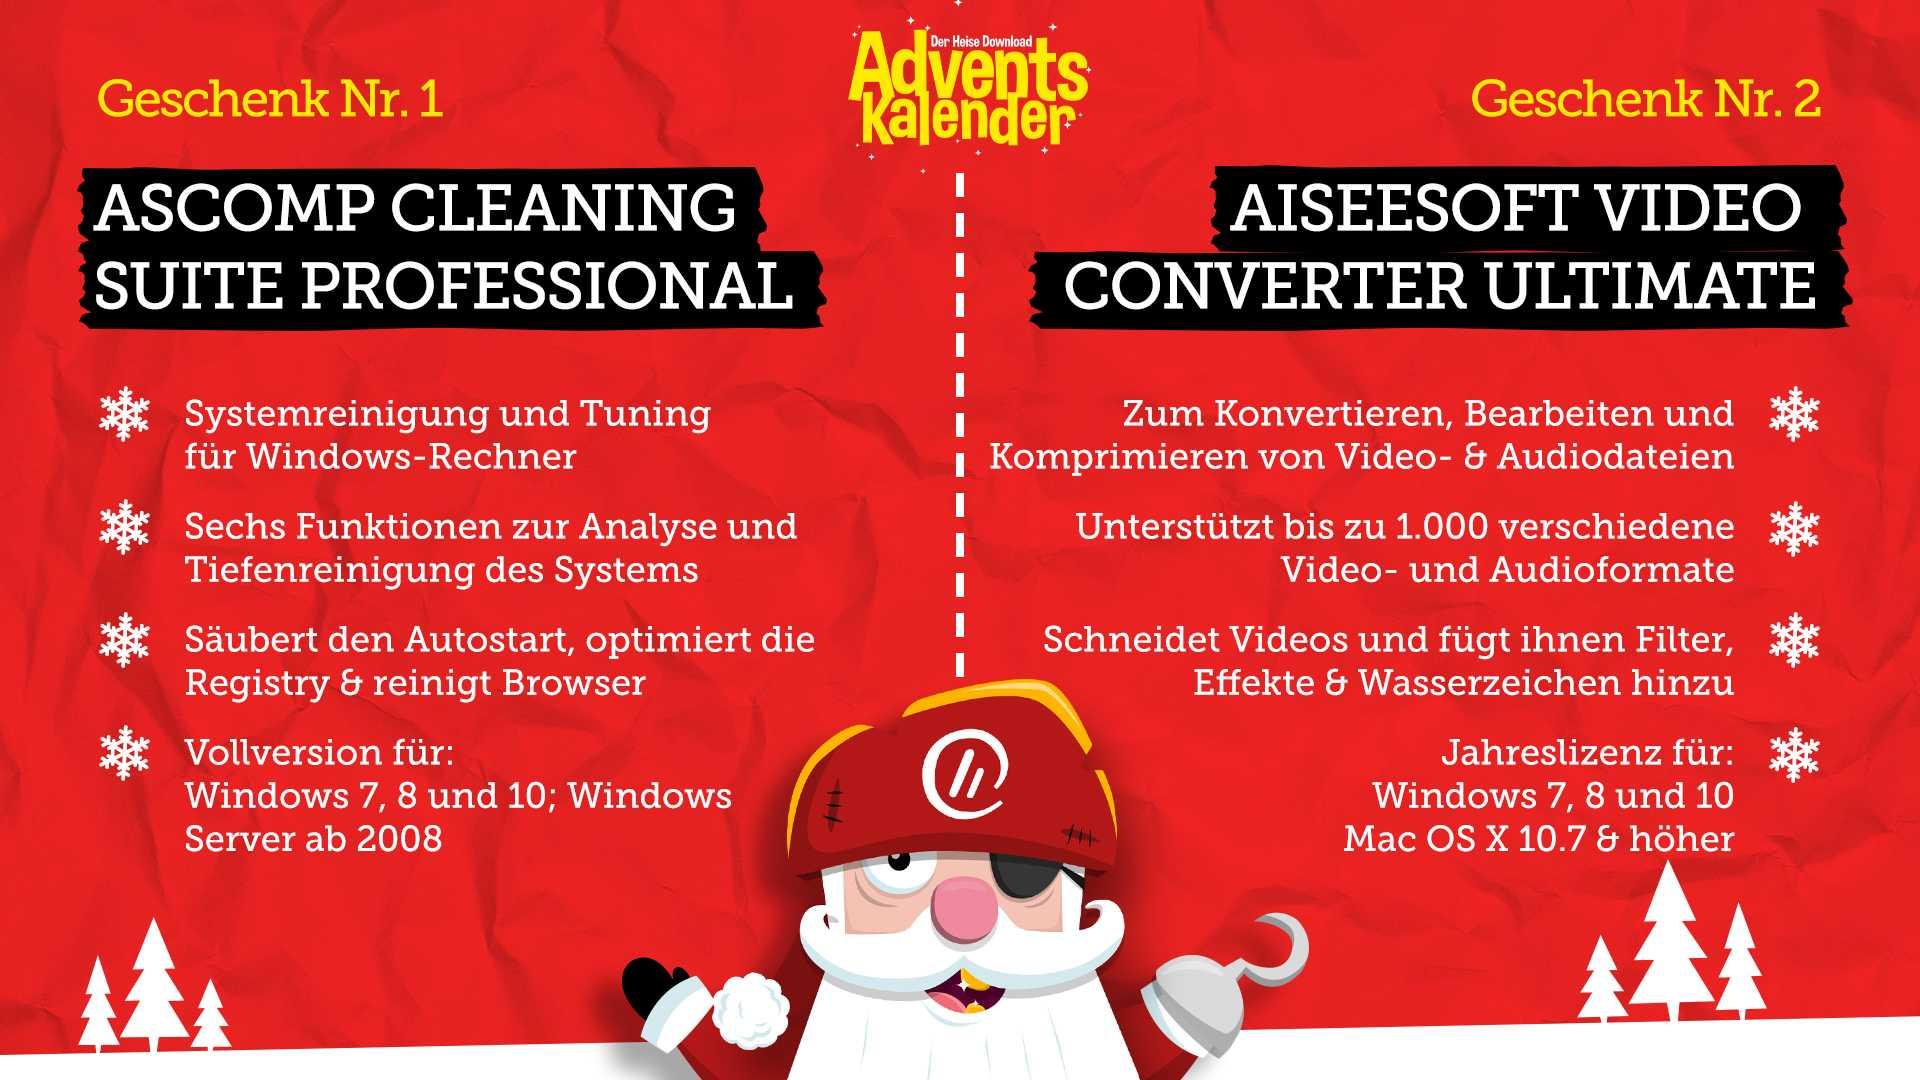 [Heise Adventskalender] ASCOMP Cleaning Suite Professional (Vollversion) + Aiseesoft Video Converter Ultimate (1-Jahres-Lizenz)